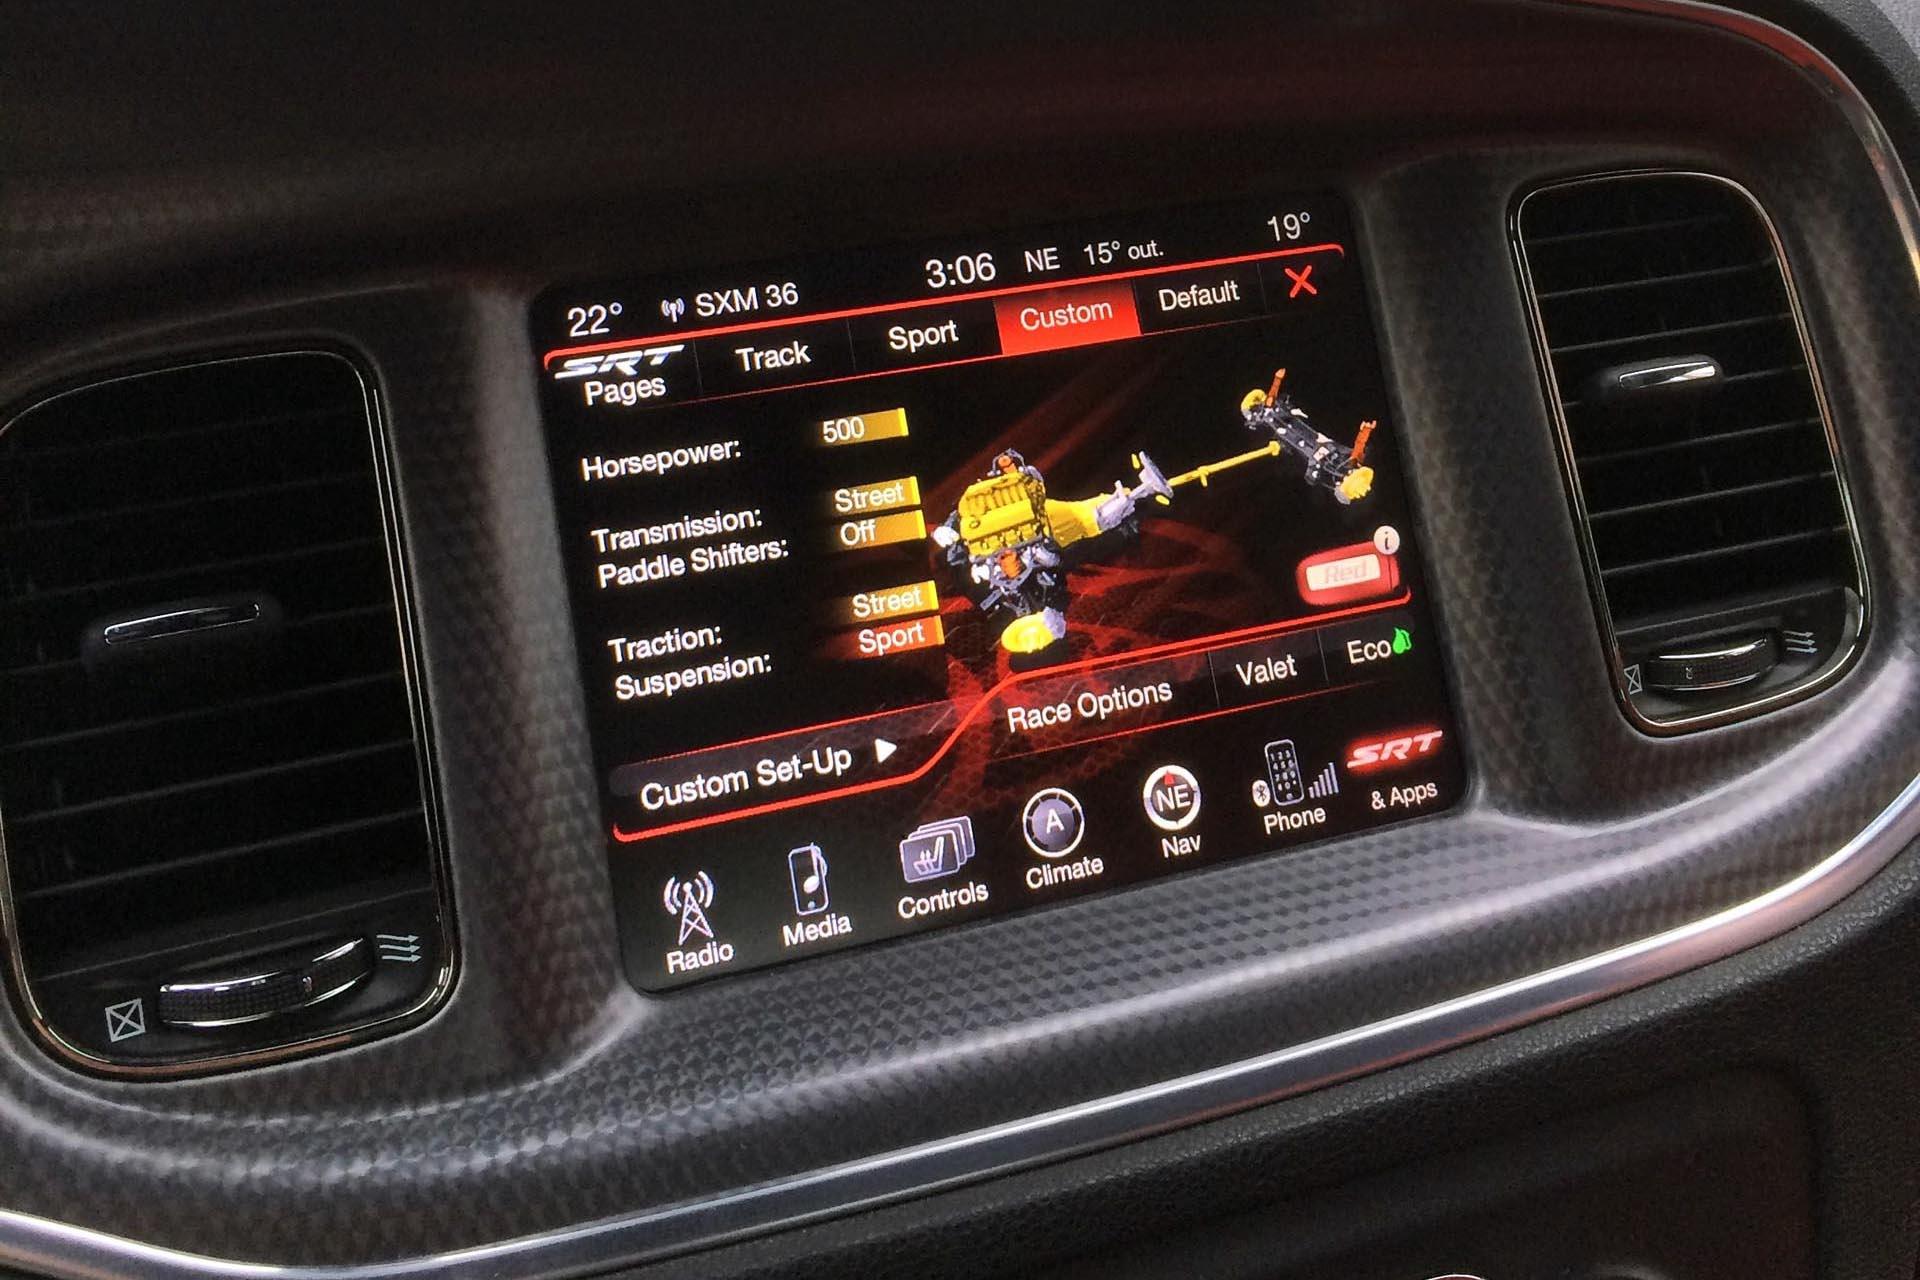 04 JY 2015 Dodge Charger SRT Hellcat Drive Mode Menu